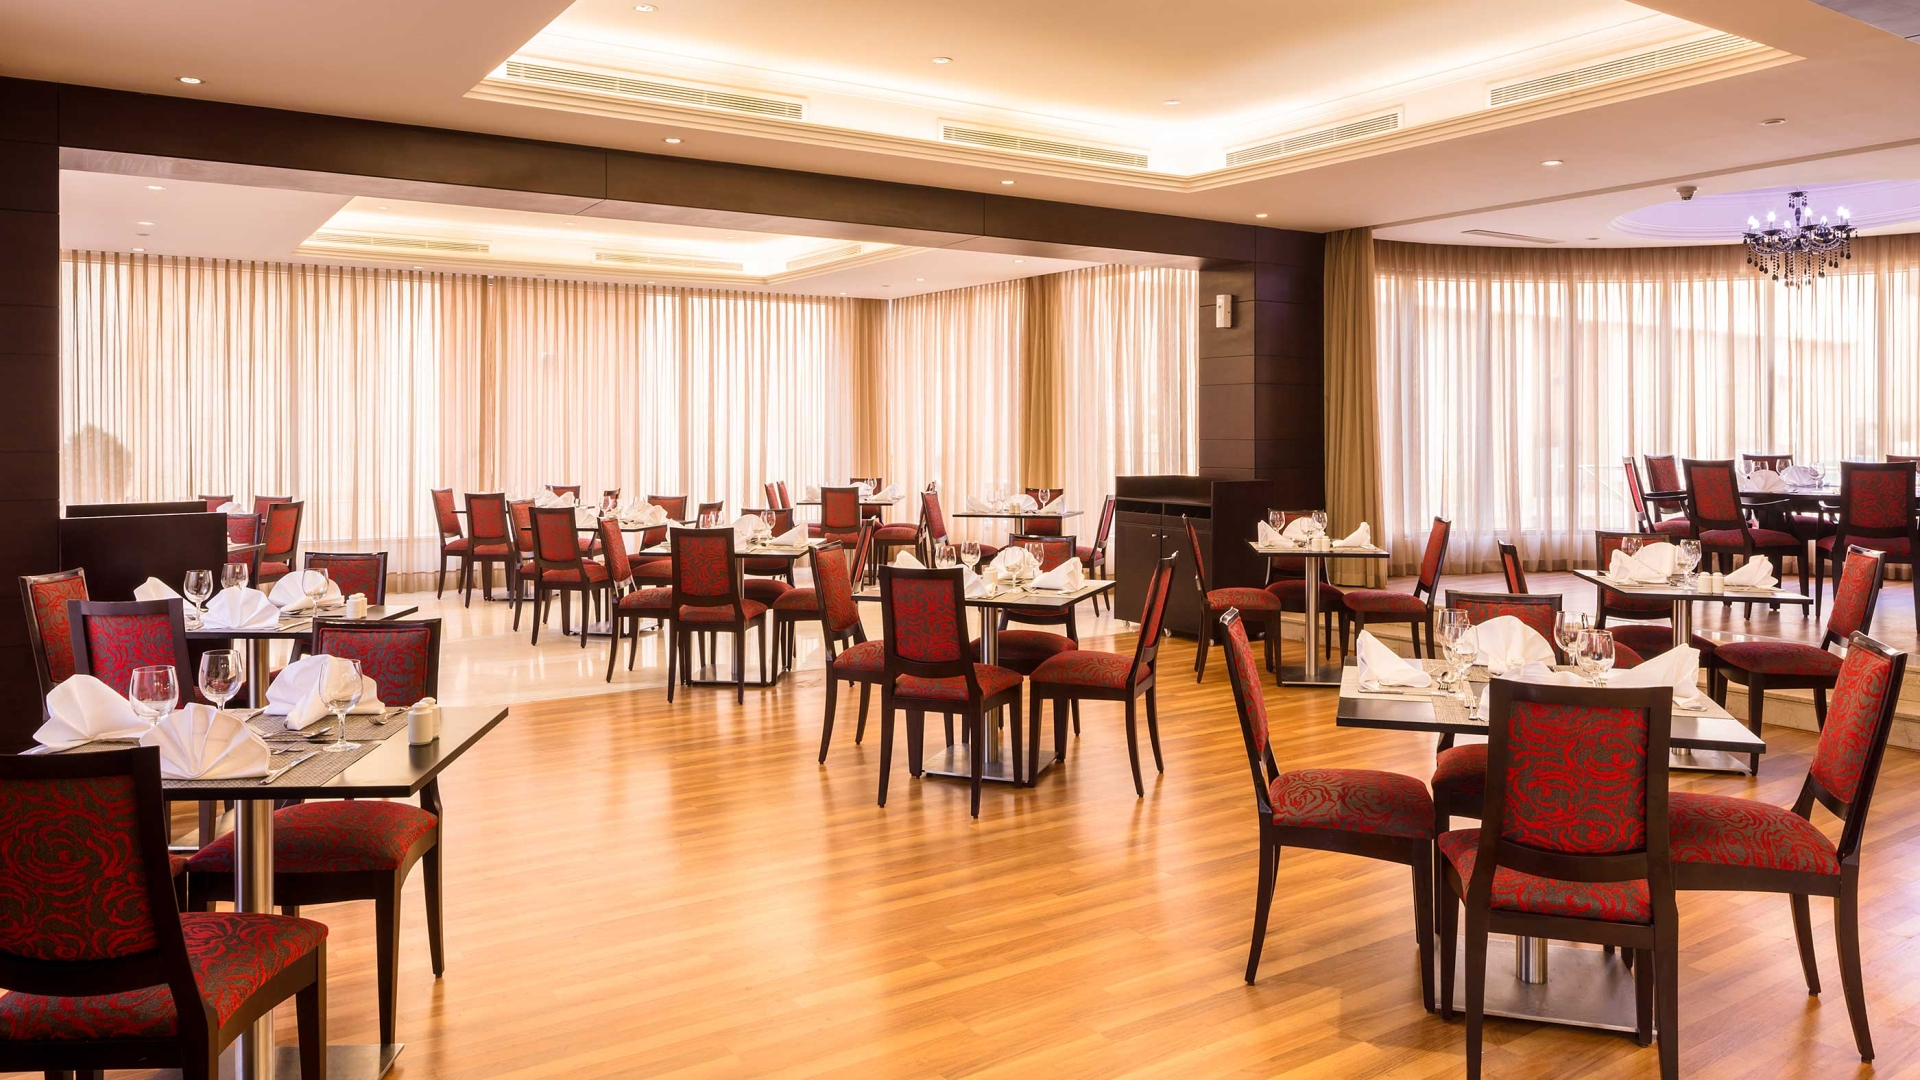 مطعم فندق كورب عمان